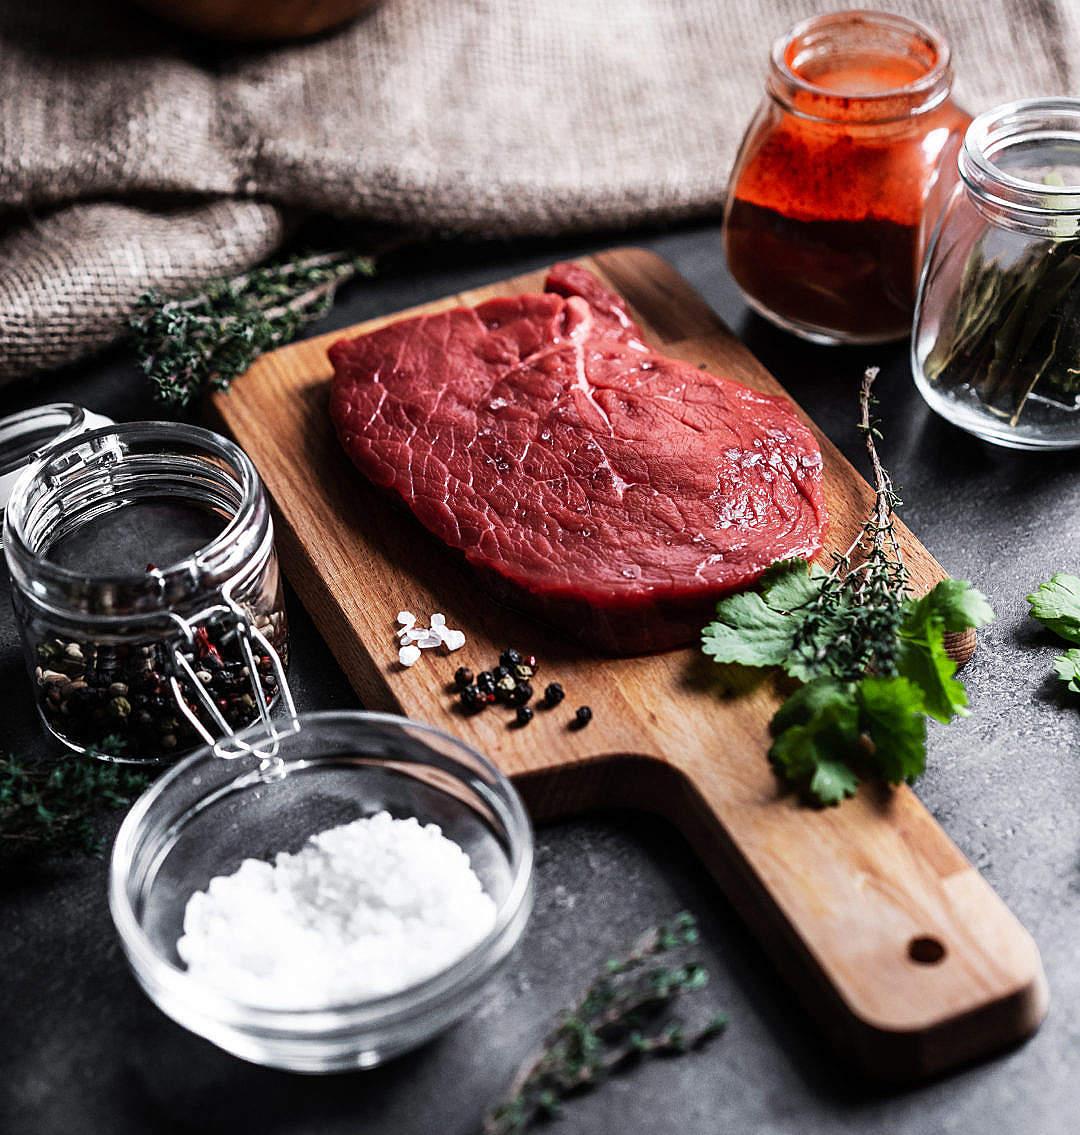 Download Preparing Beef Steak Close Up FREE Stock Photo